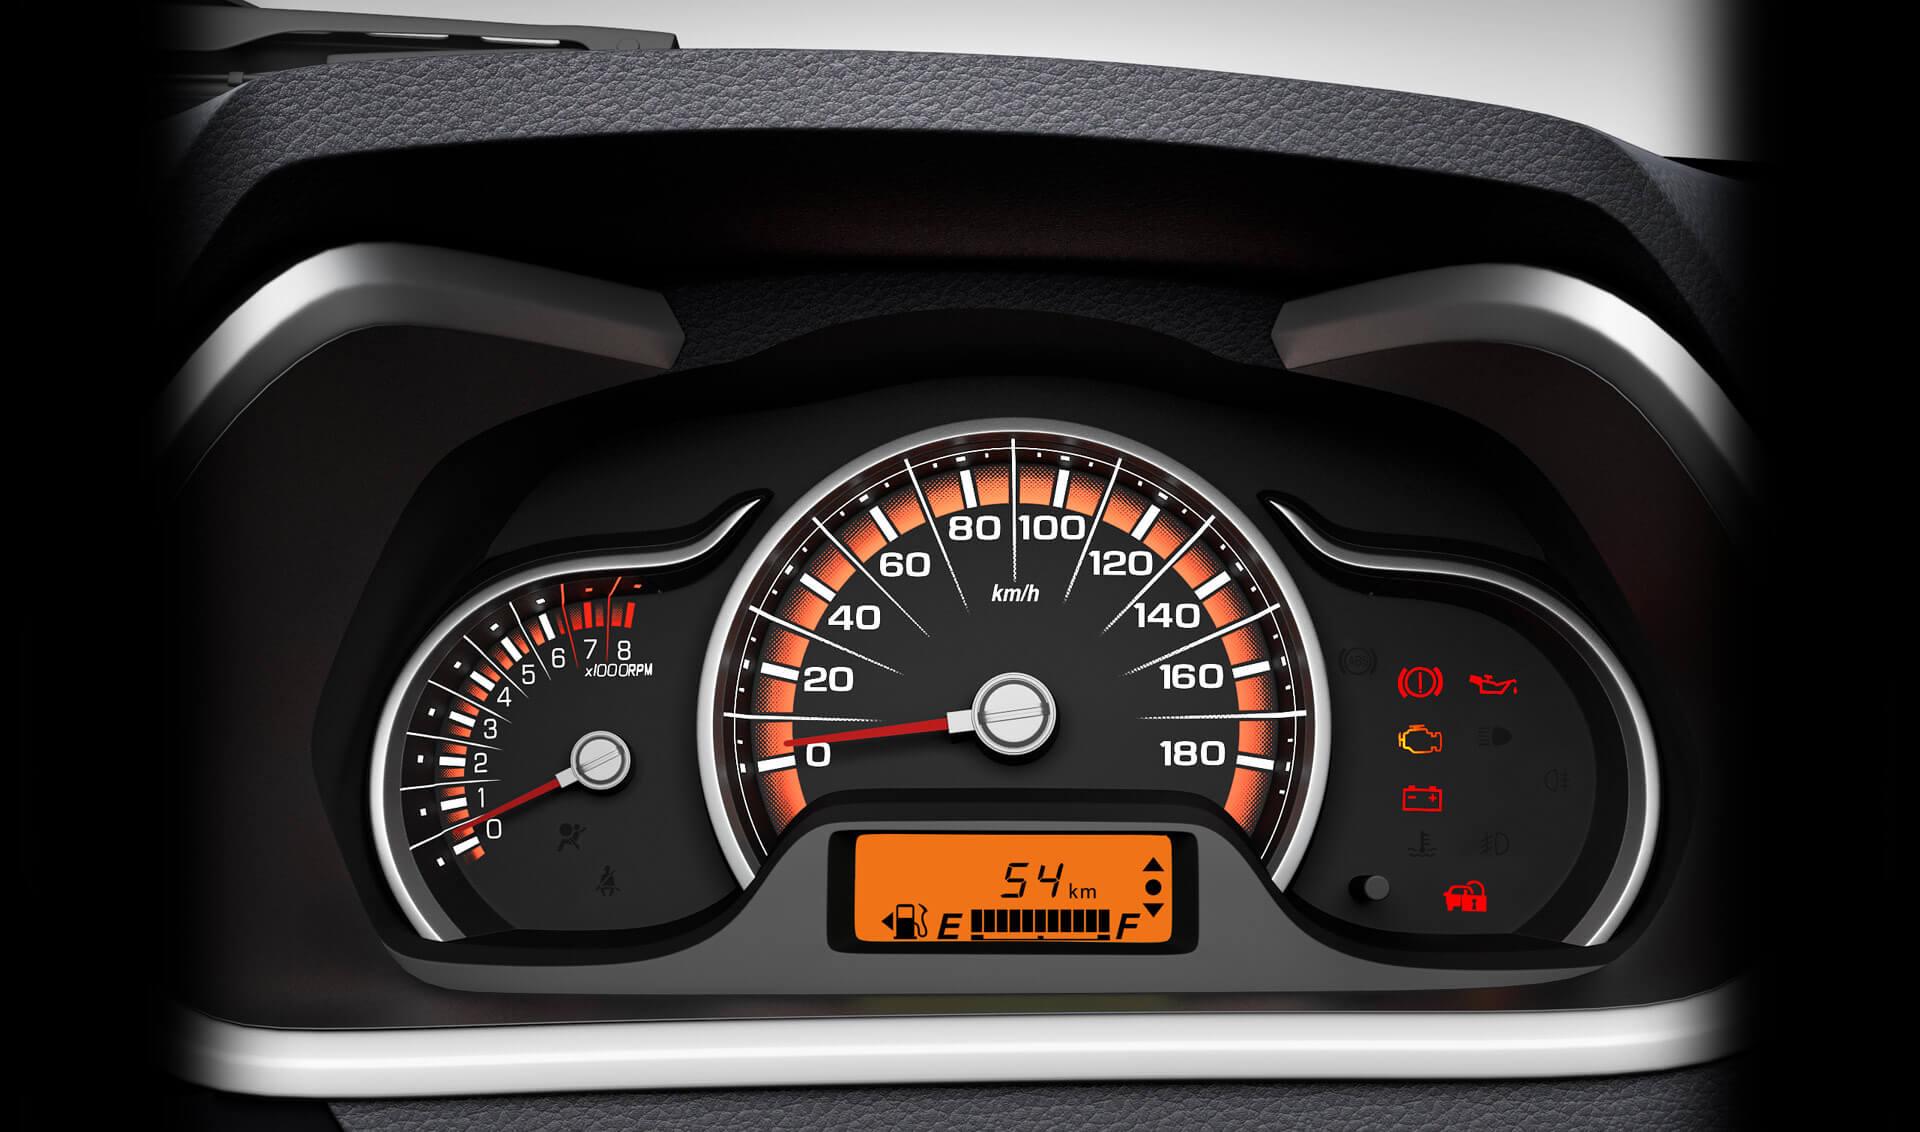 Maruti Suzuki Alto K10 On Road Price Showroom Price And Technical